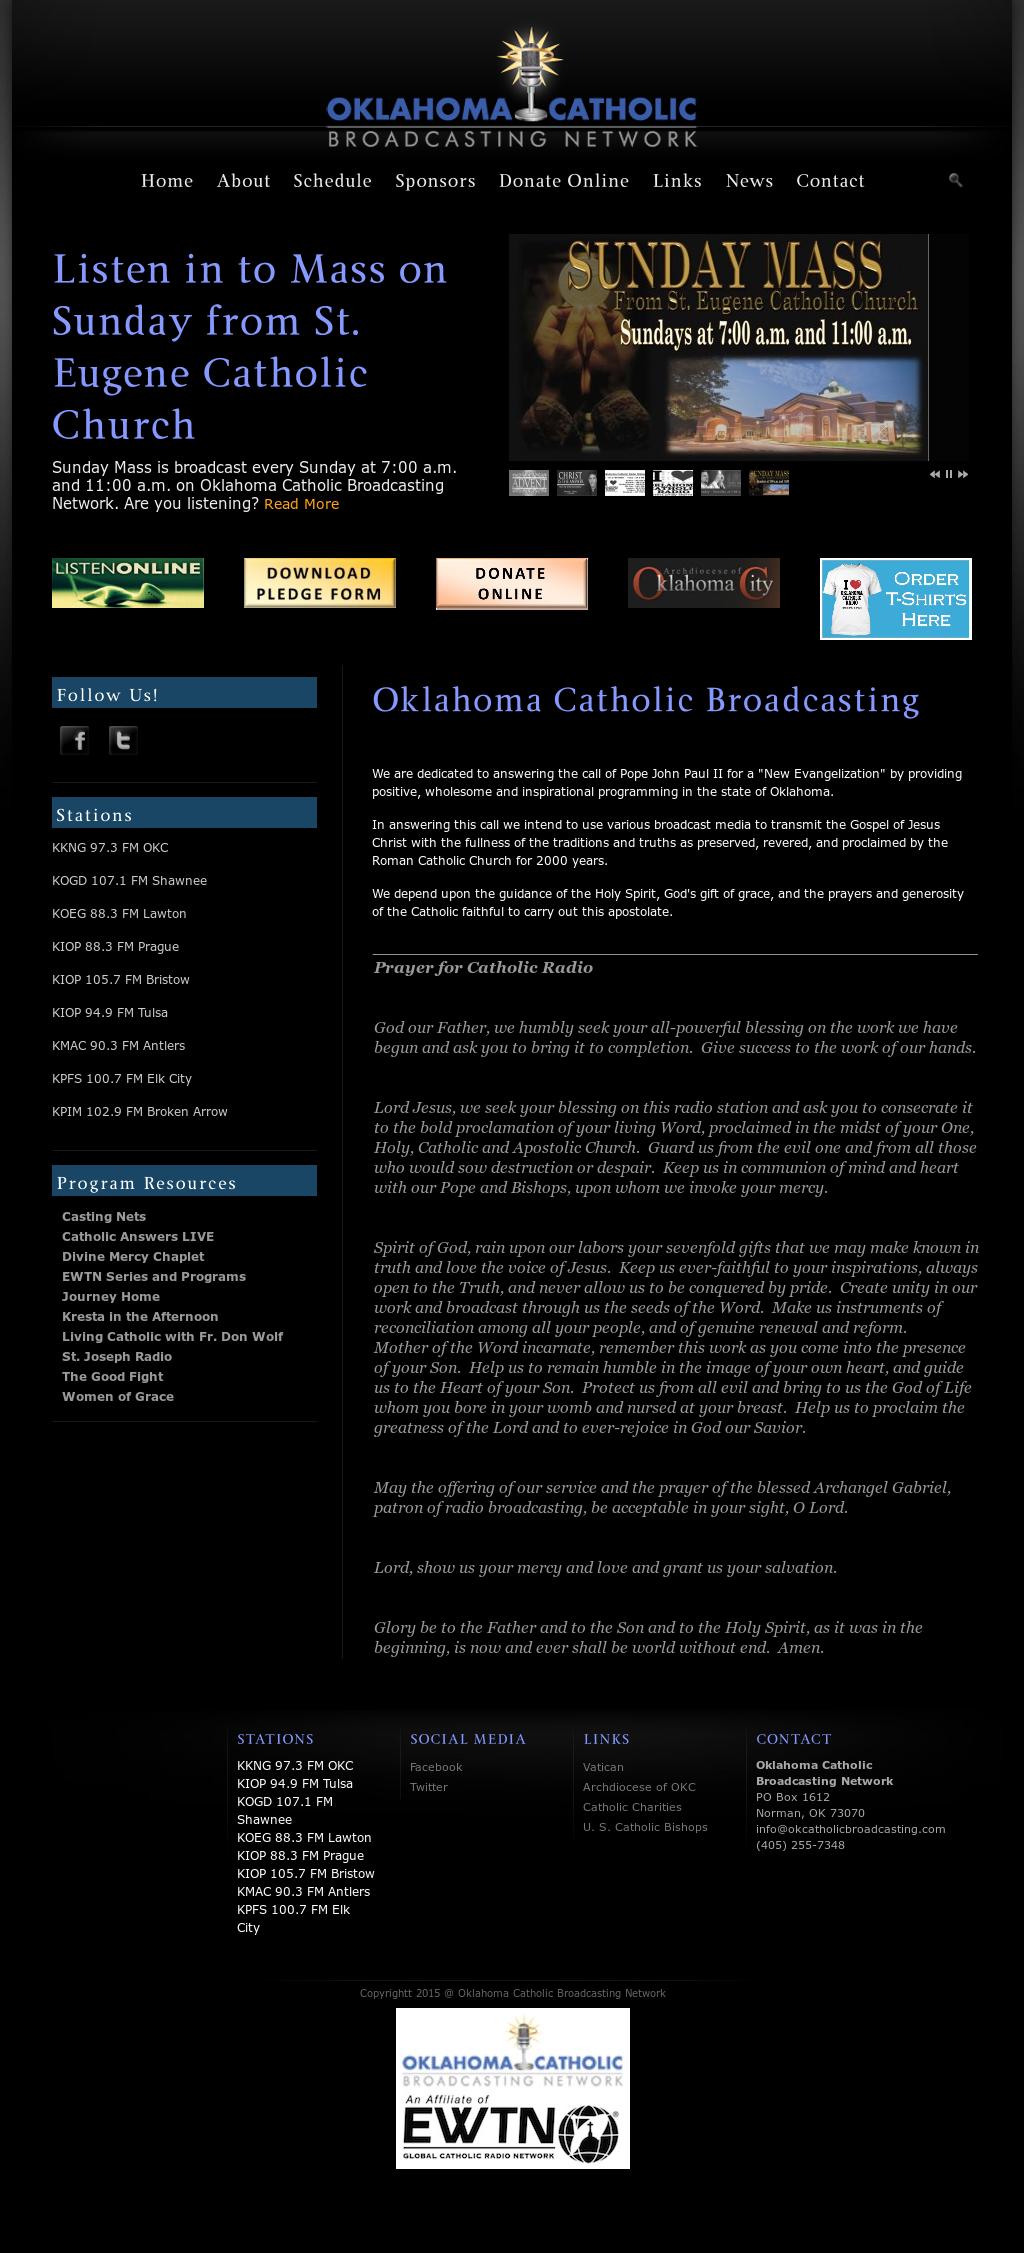 Oklahoma Catholic Broadcasting Network Competitors, Revenue